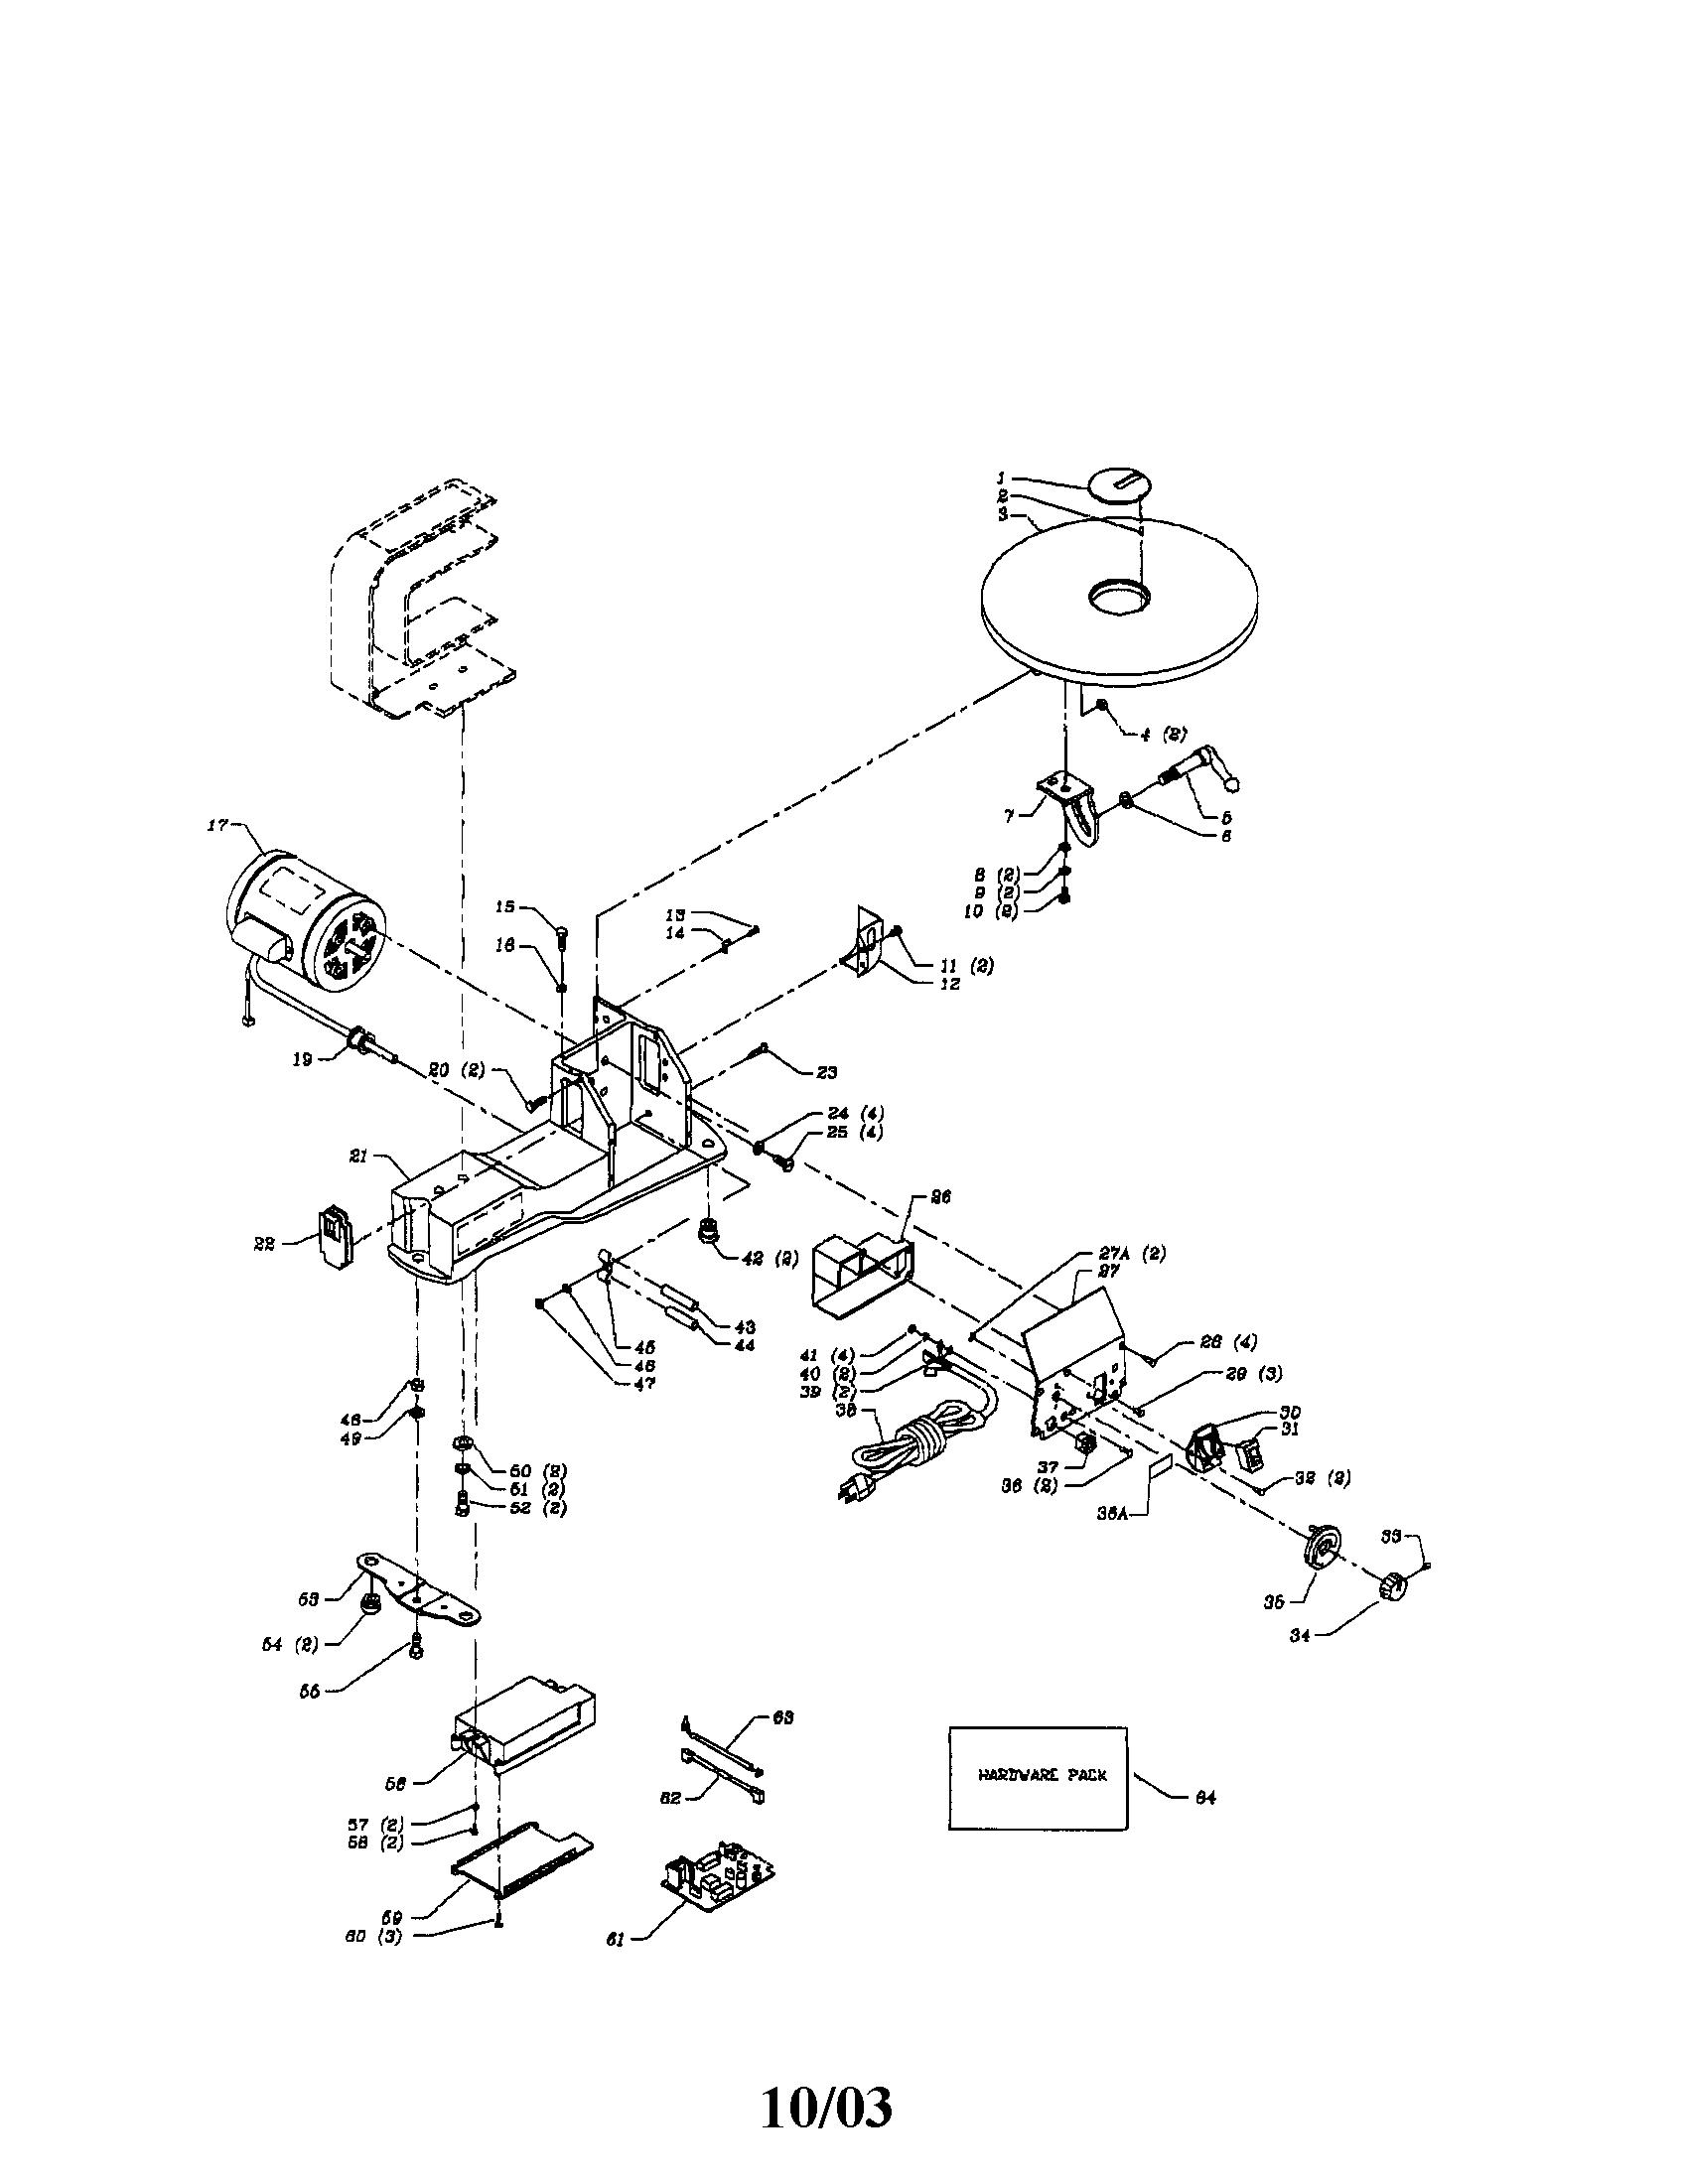 Milwaukee sawzall wiring diagram wiring diagram and engine diagram